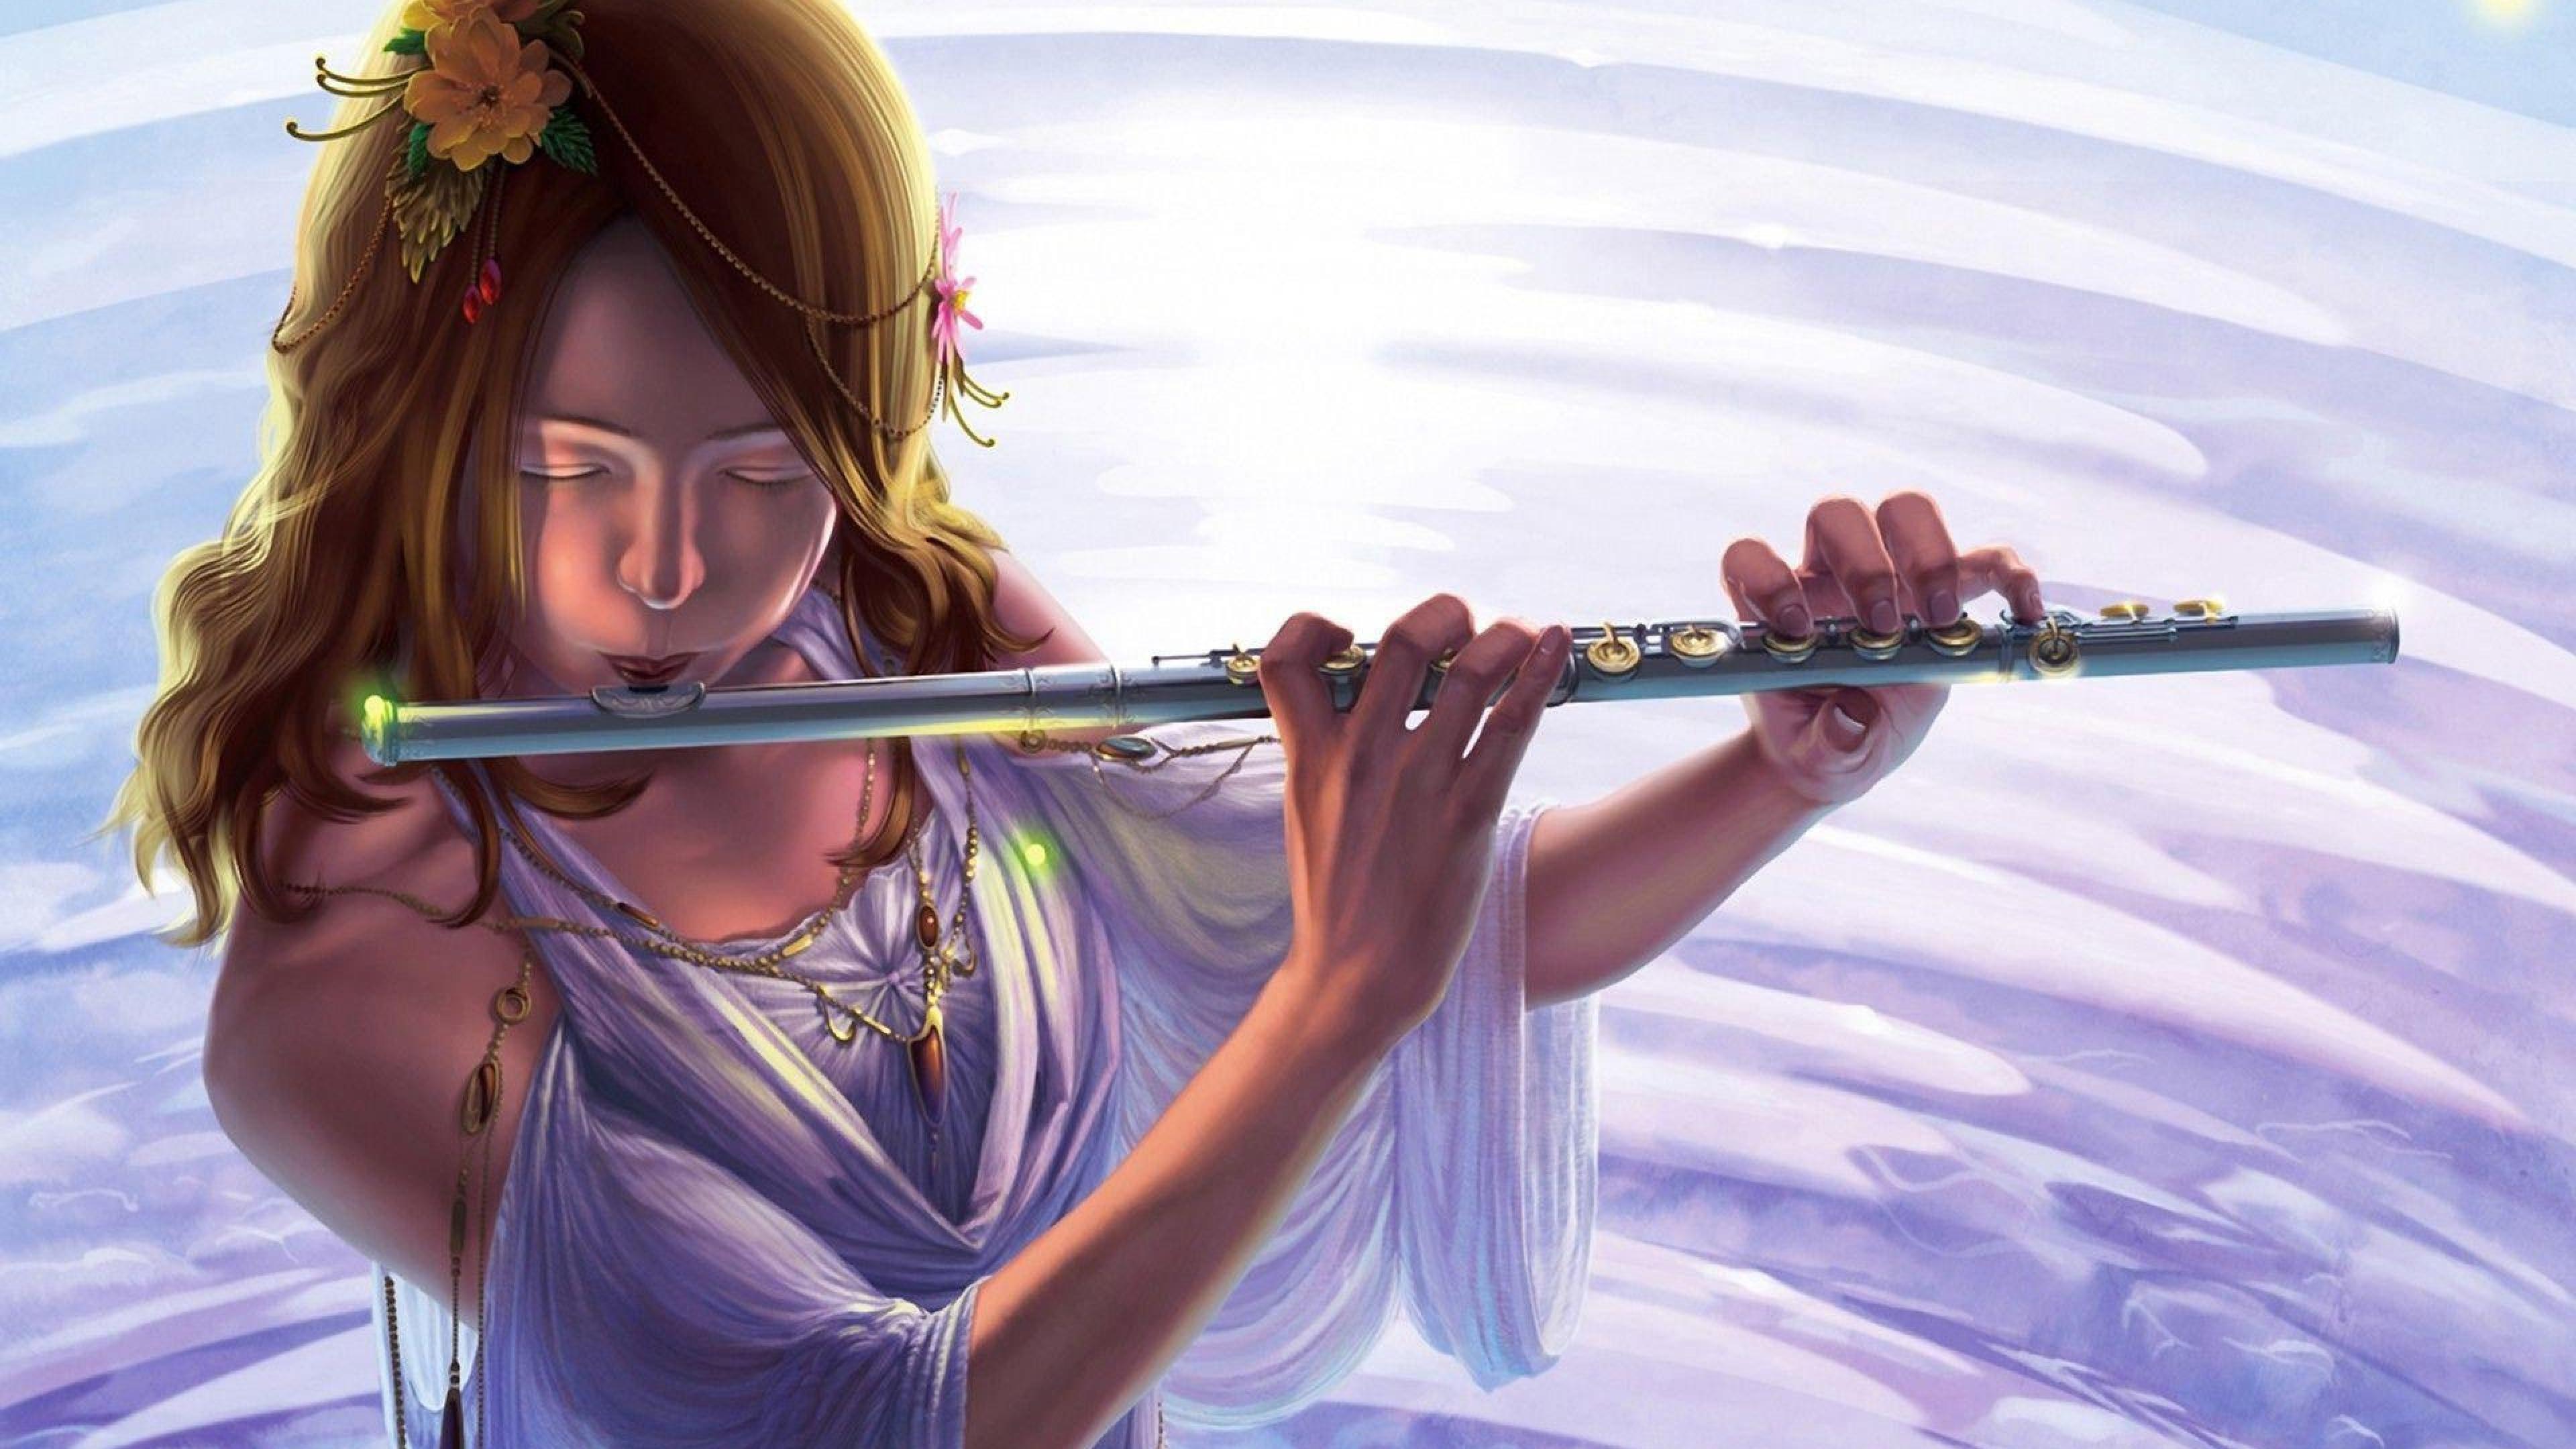 Digital Woman Playing the flute Art Flute HD Wallpapers, Desktop ...